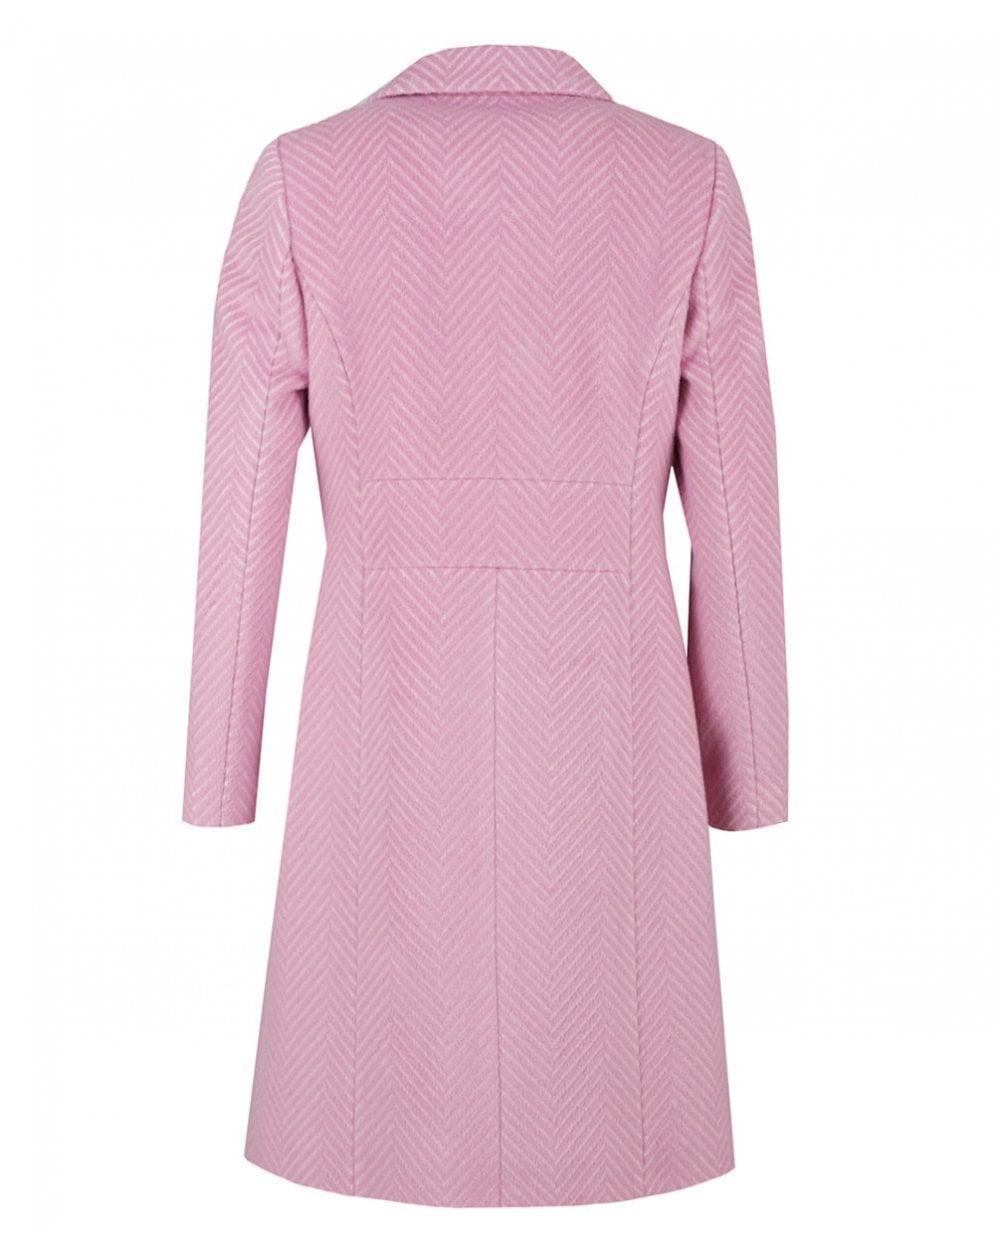 78d7dd6a6d2125 Lyst - Ted Baker Chevron Wool Coat in Pink